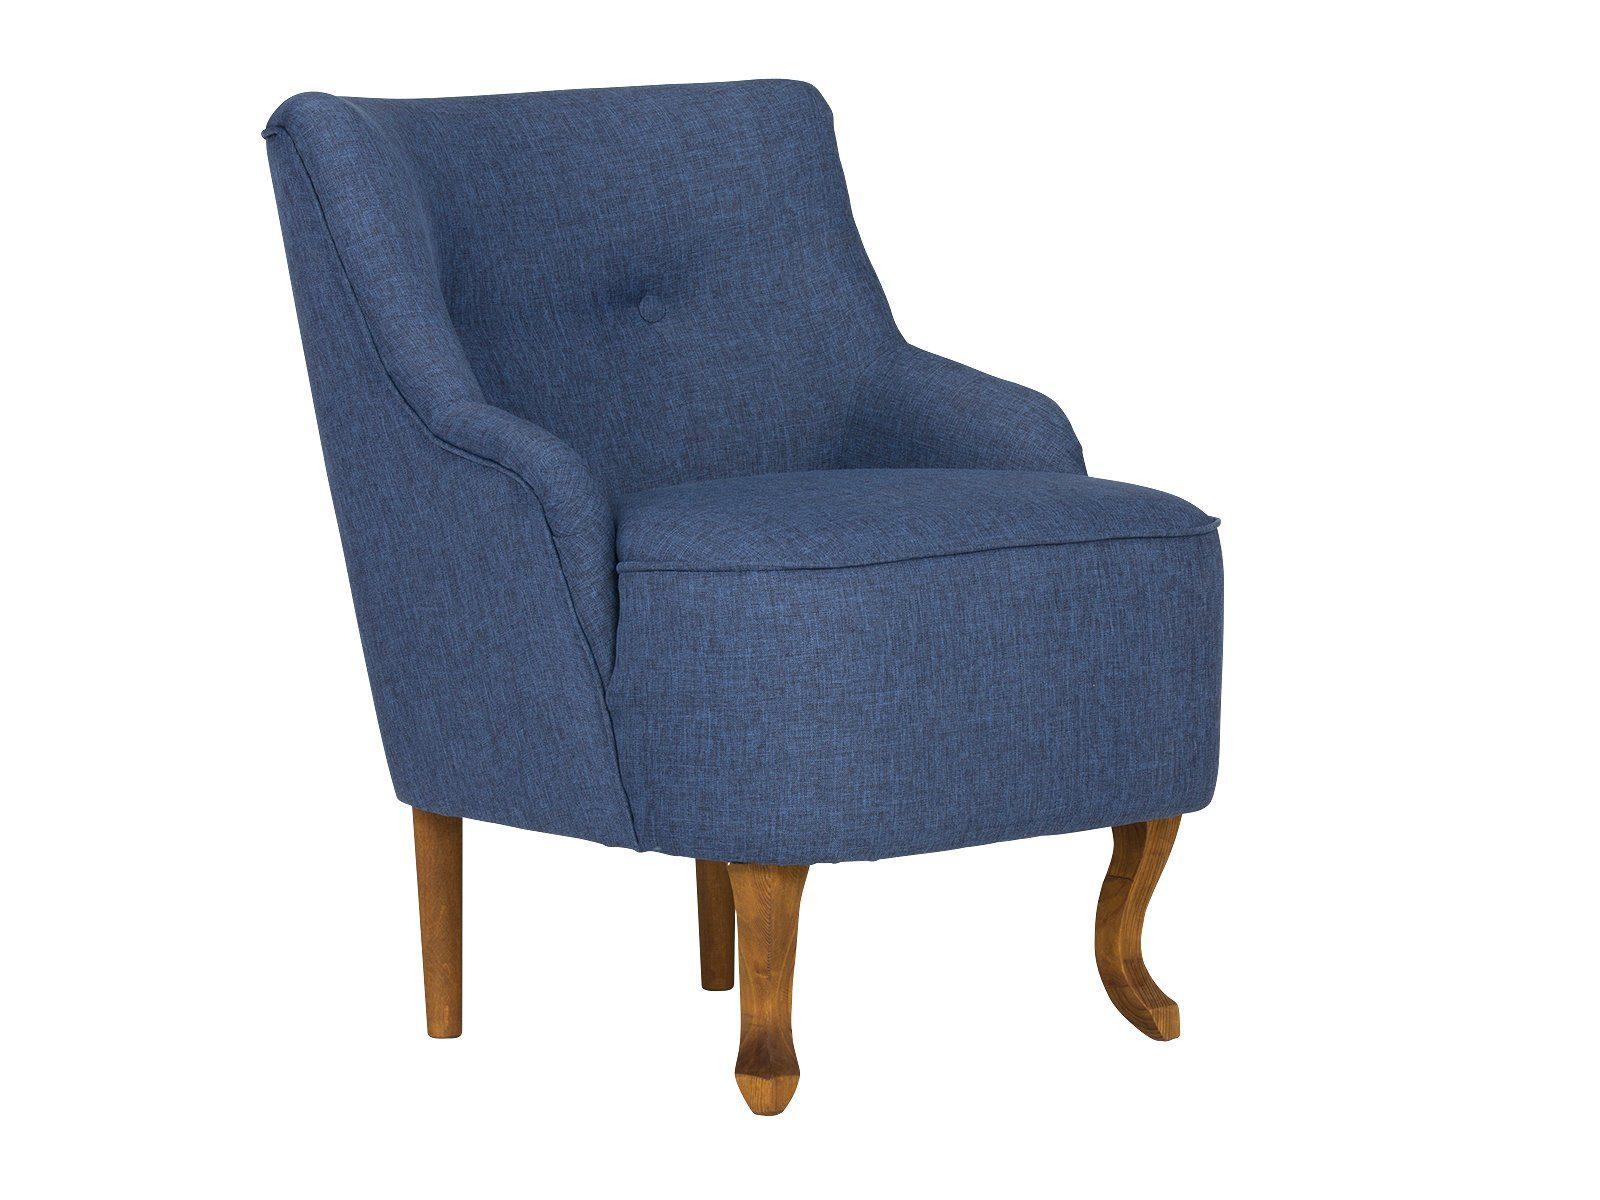 massivum Sessel aus Flachgewebe »Eraton «